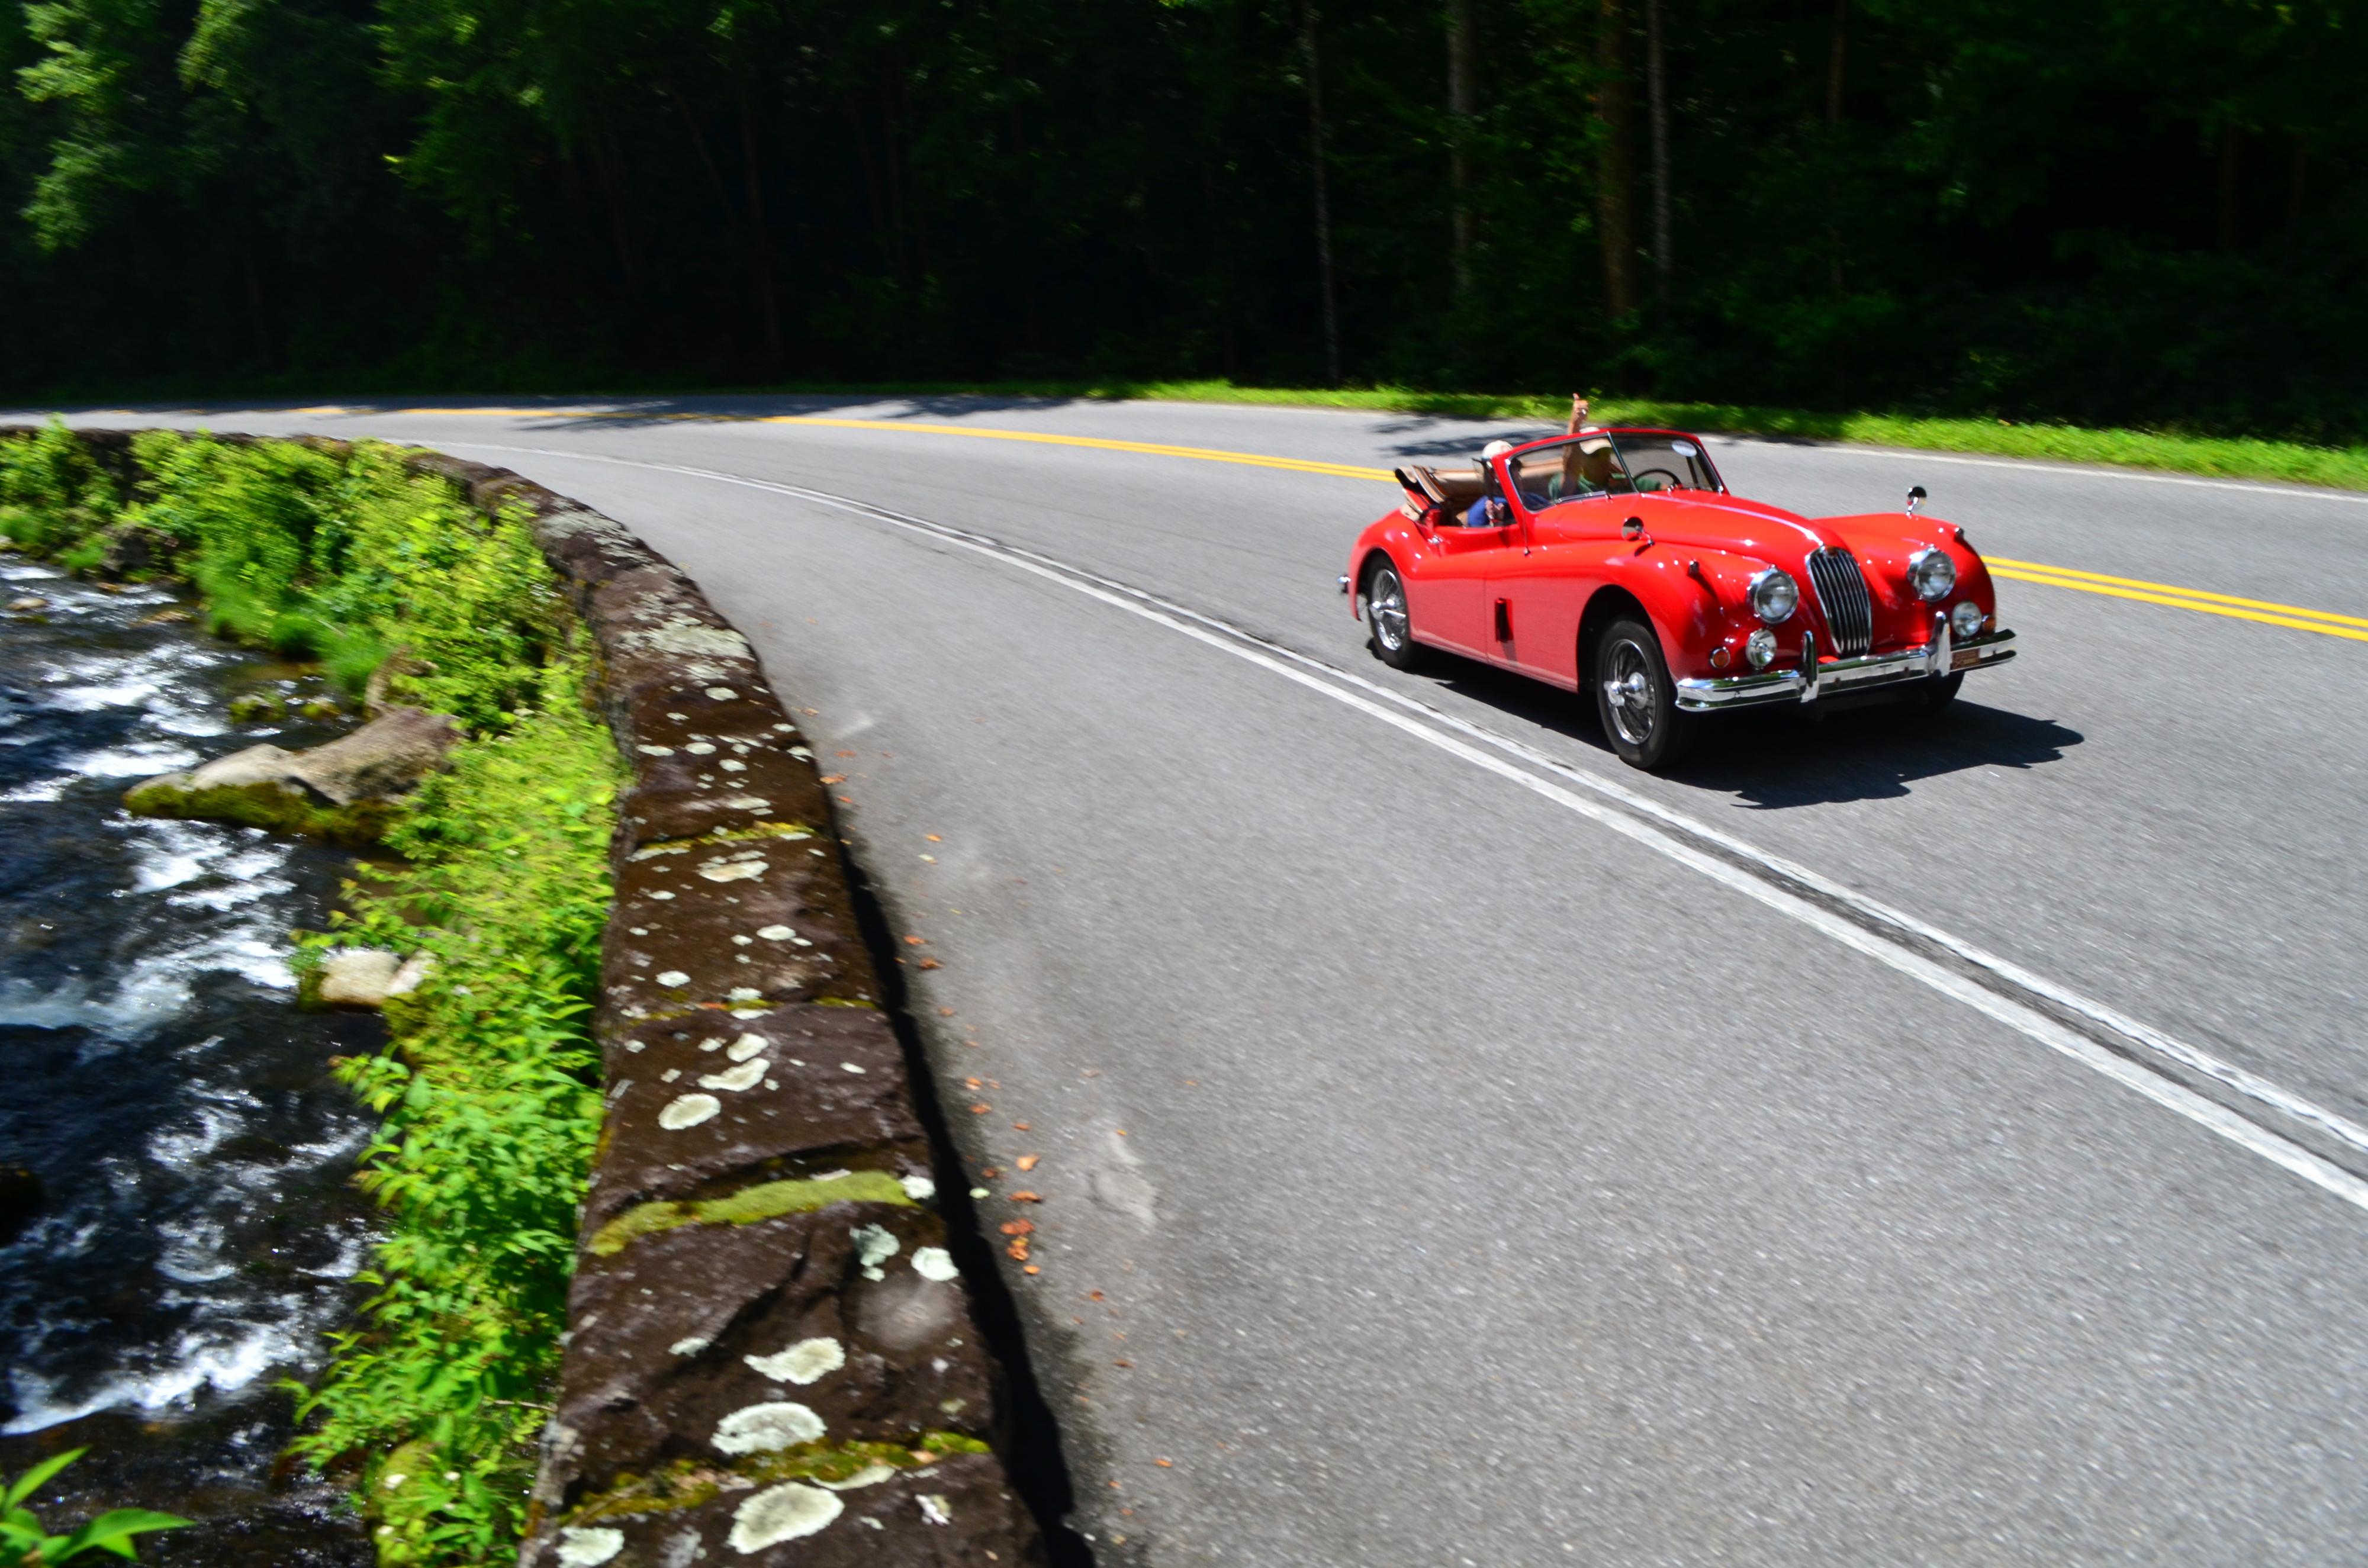 XK 140 overheating | Jaguar Clubs of North America